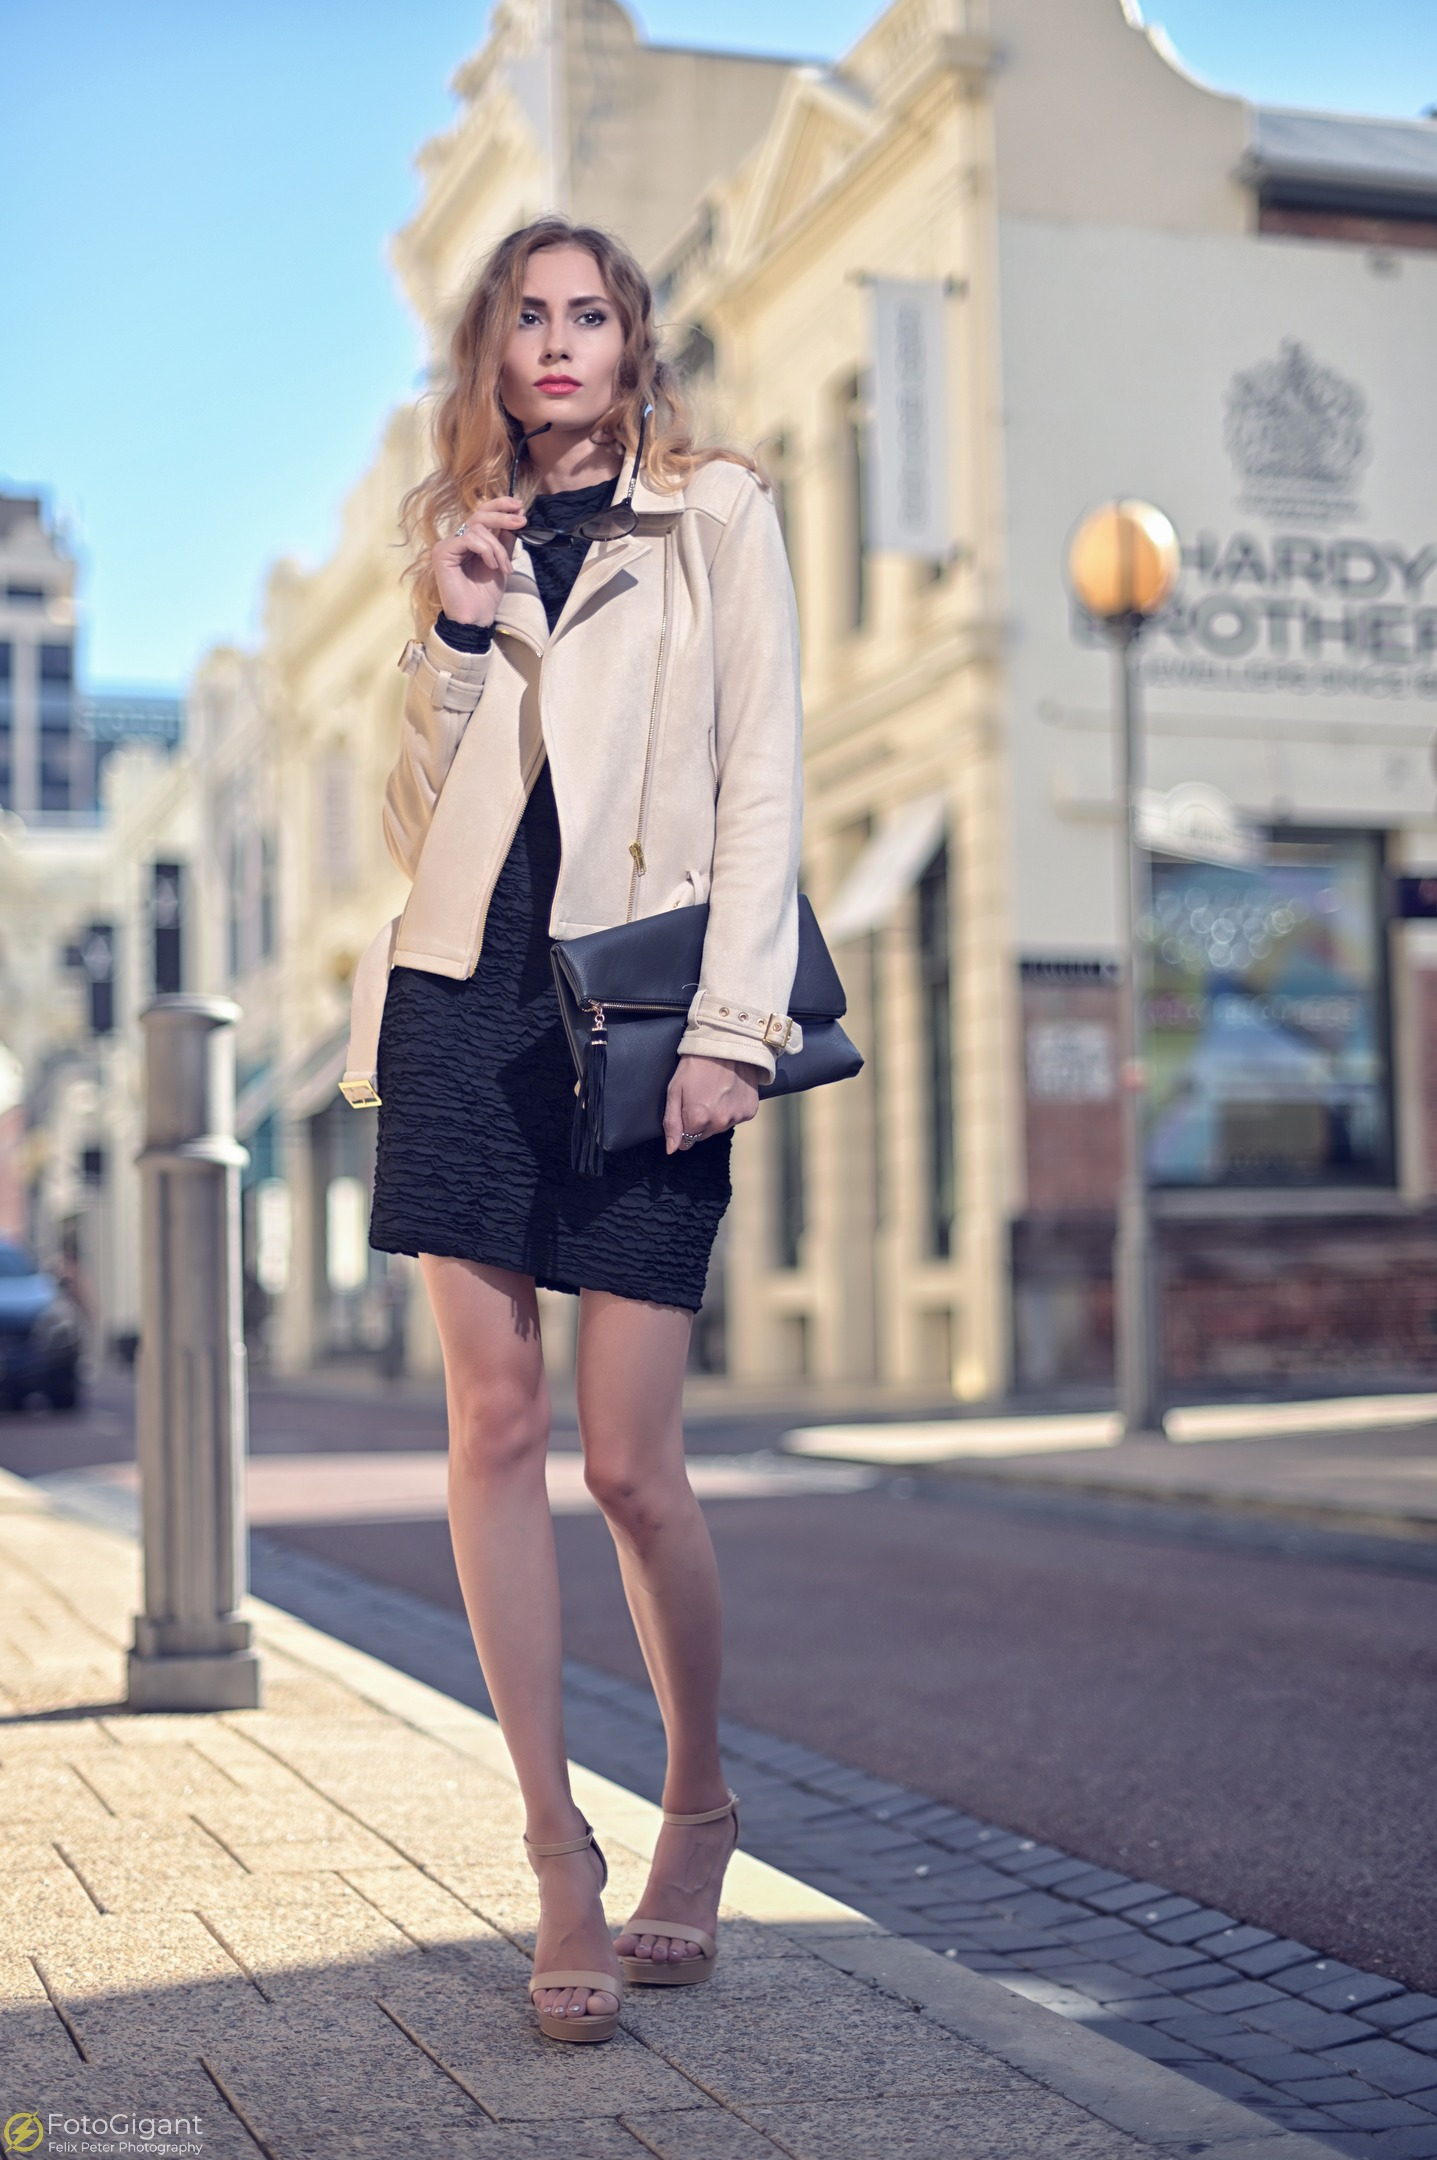 Fashion-Model-Photography_International_02.jpg